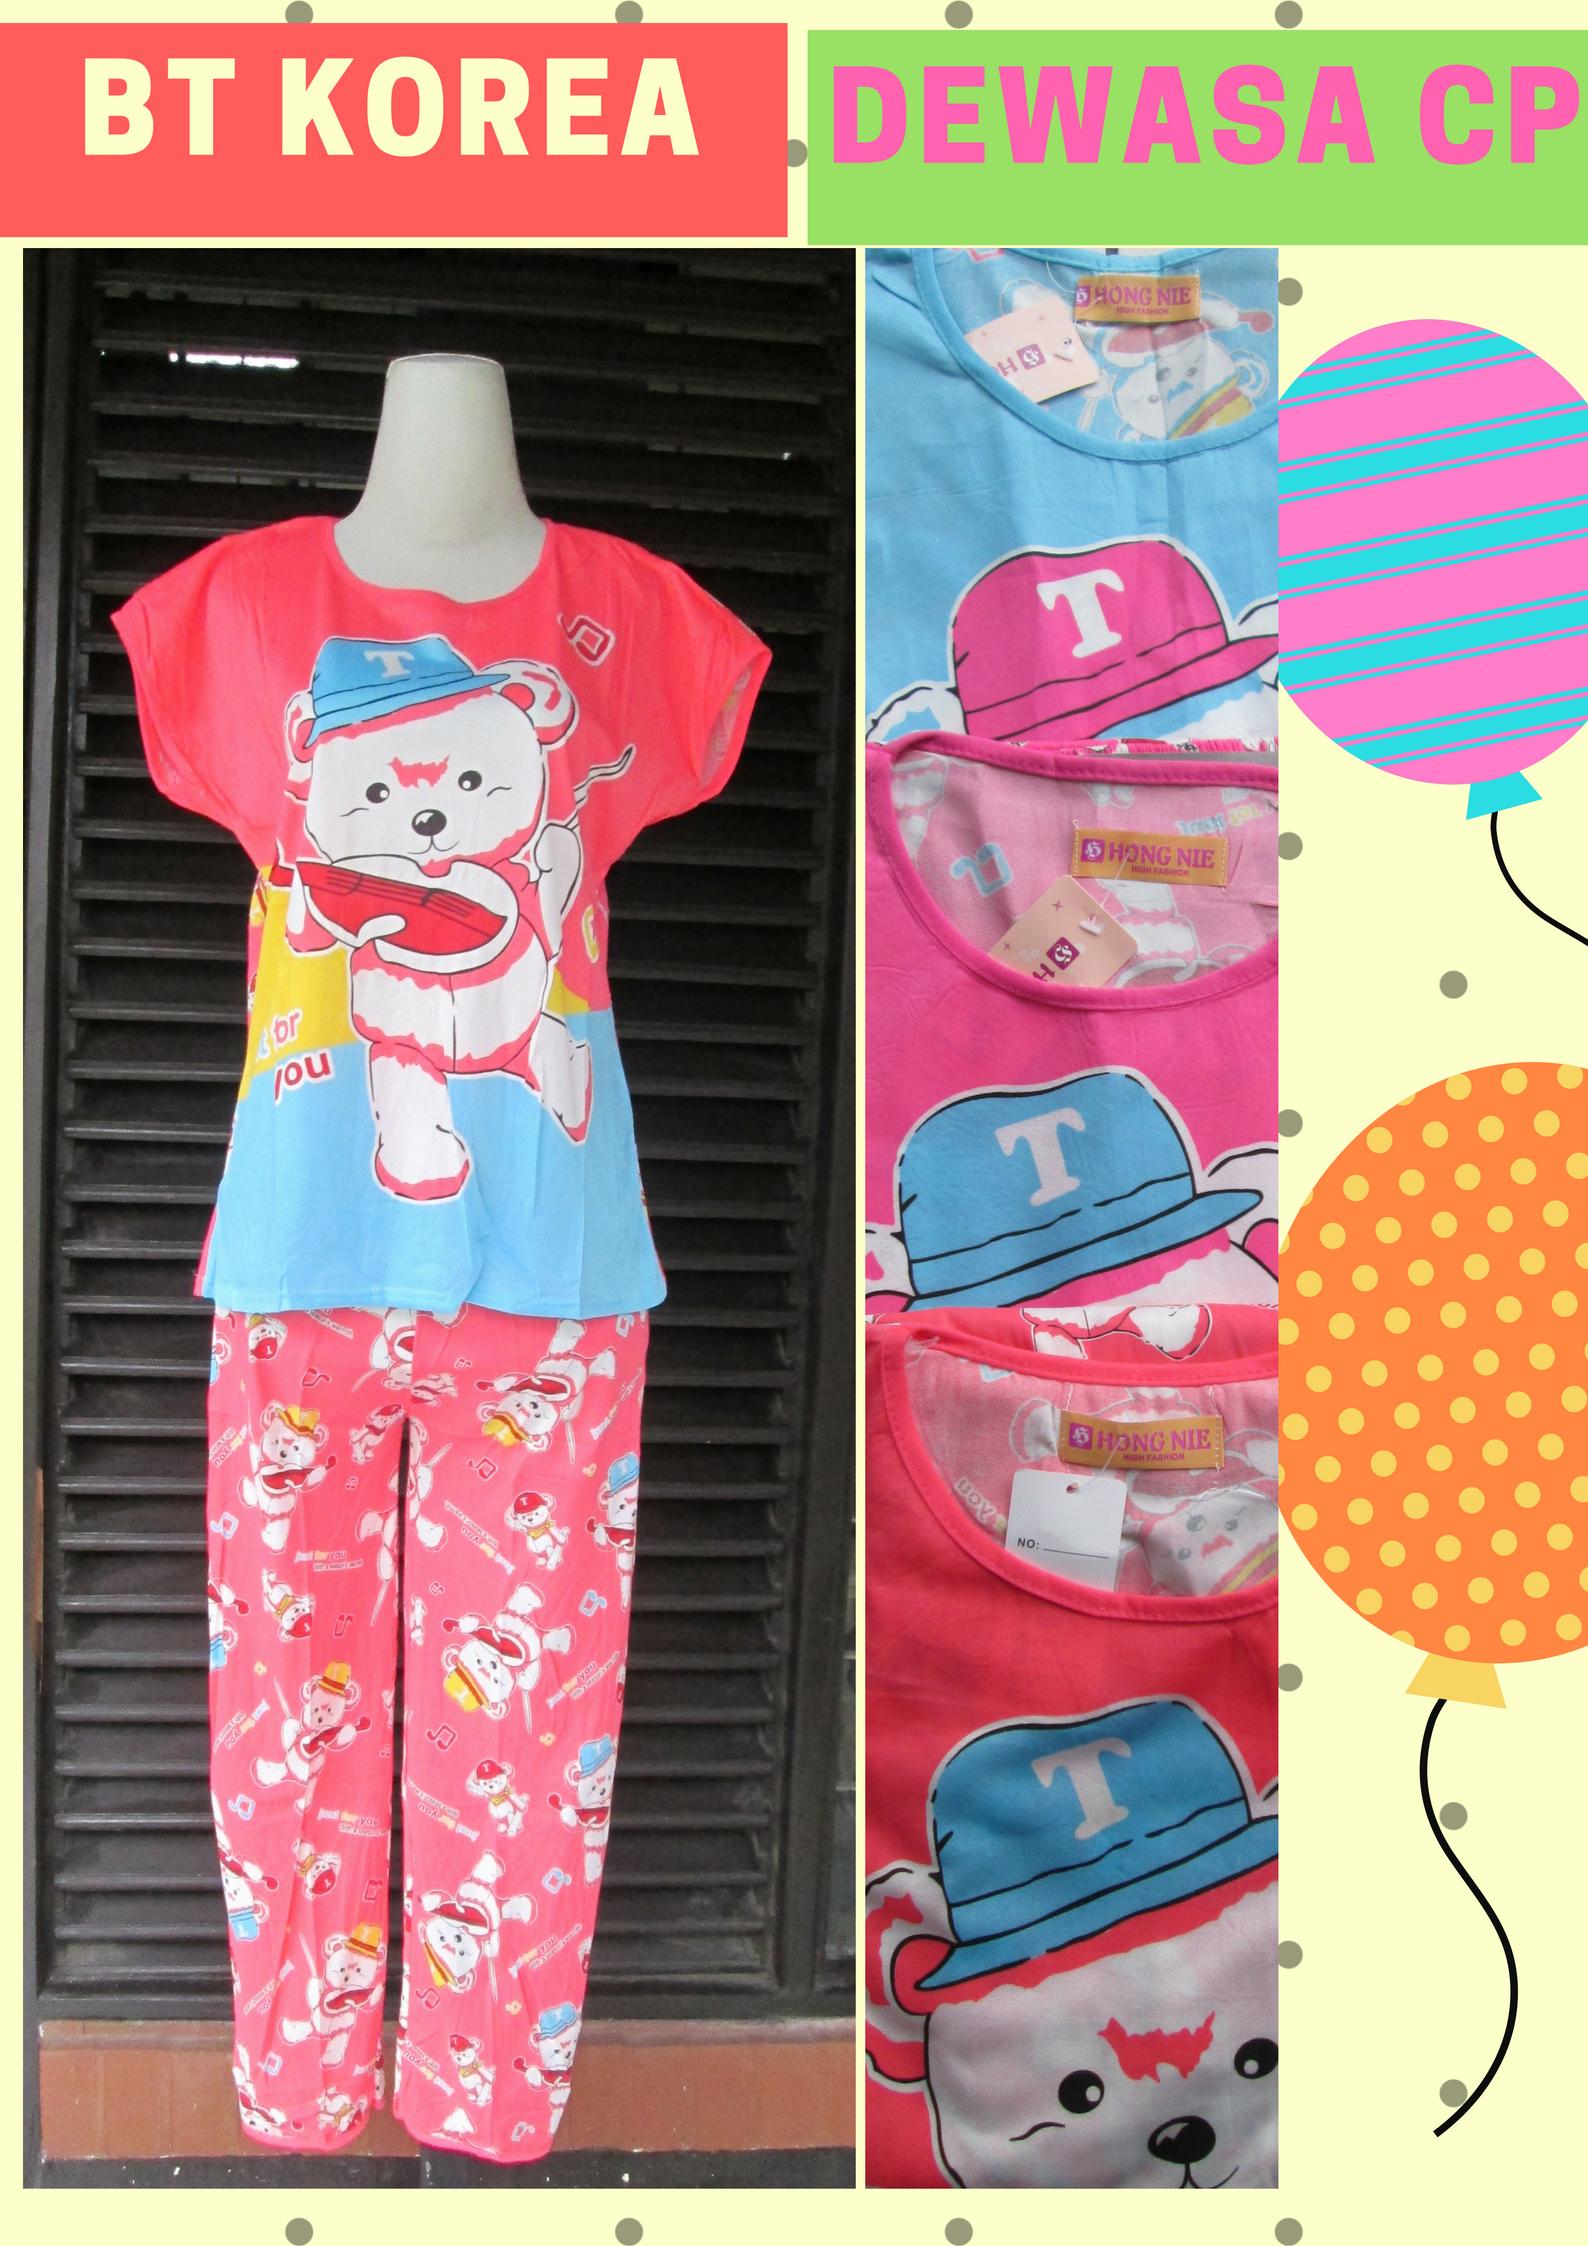 Distributor Baju Tidur KOREA CP DEWASA Murah